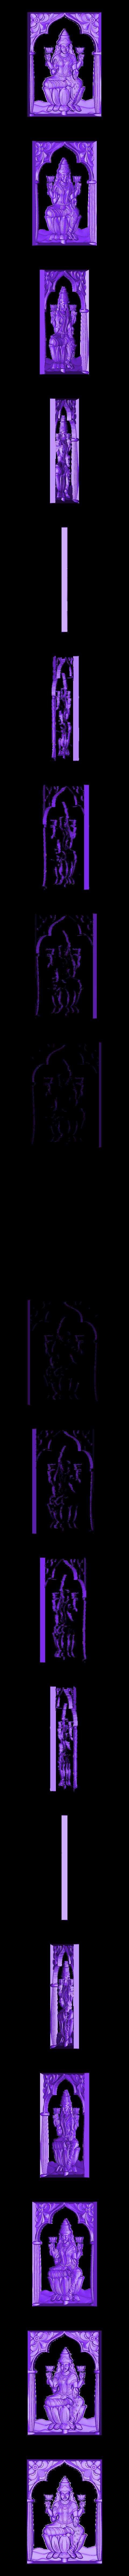 VRDG023.stl Download free STL file laxmi • Object to 3D print, koithoju